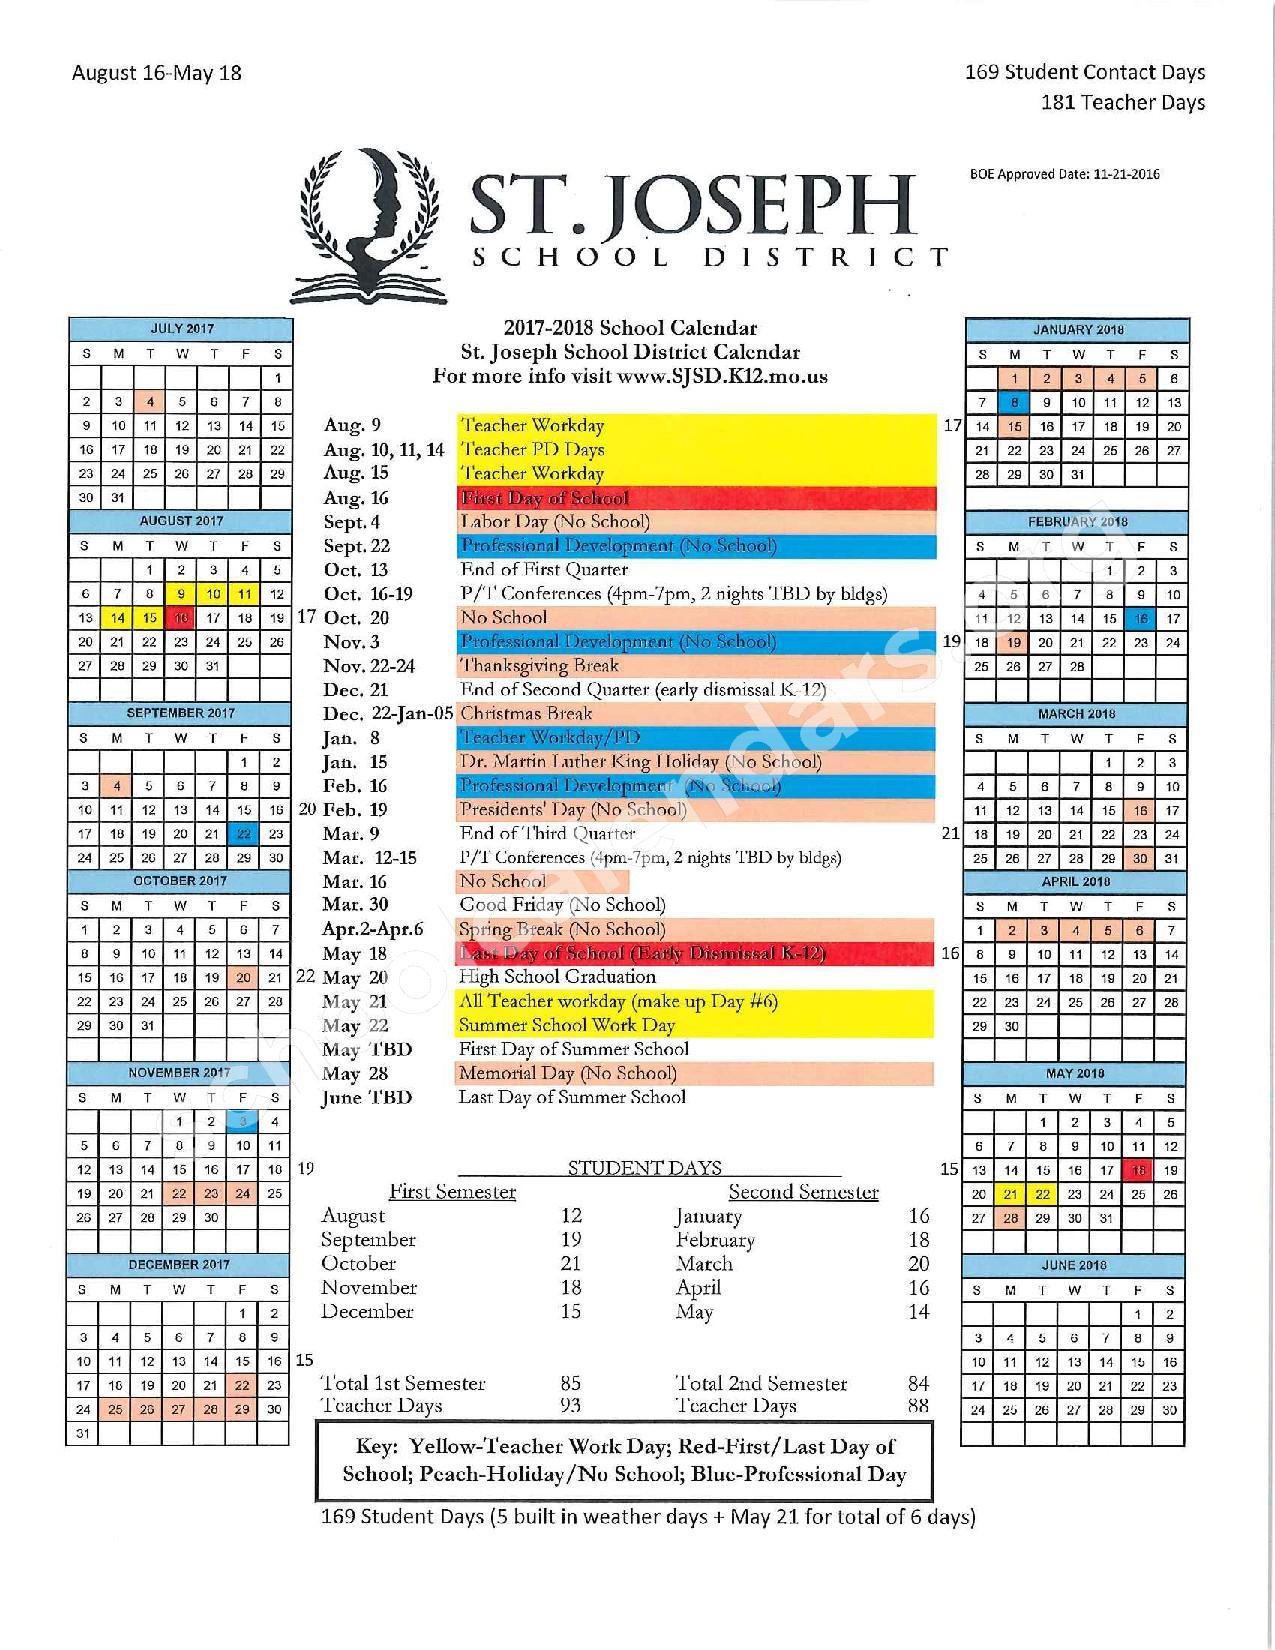 2017 - 2018 Academic Calendar – St. Joseph School District – page 1